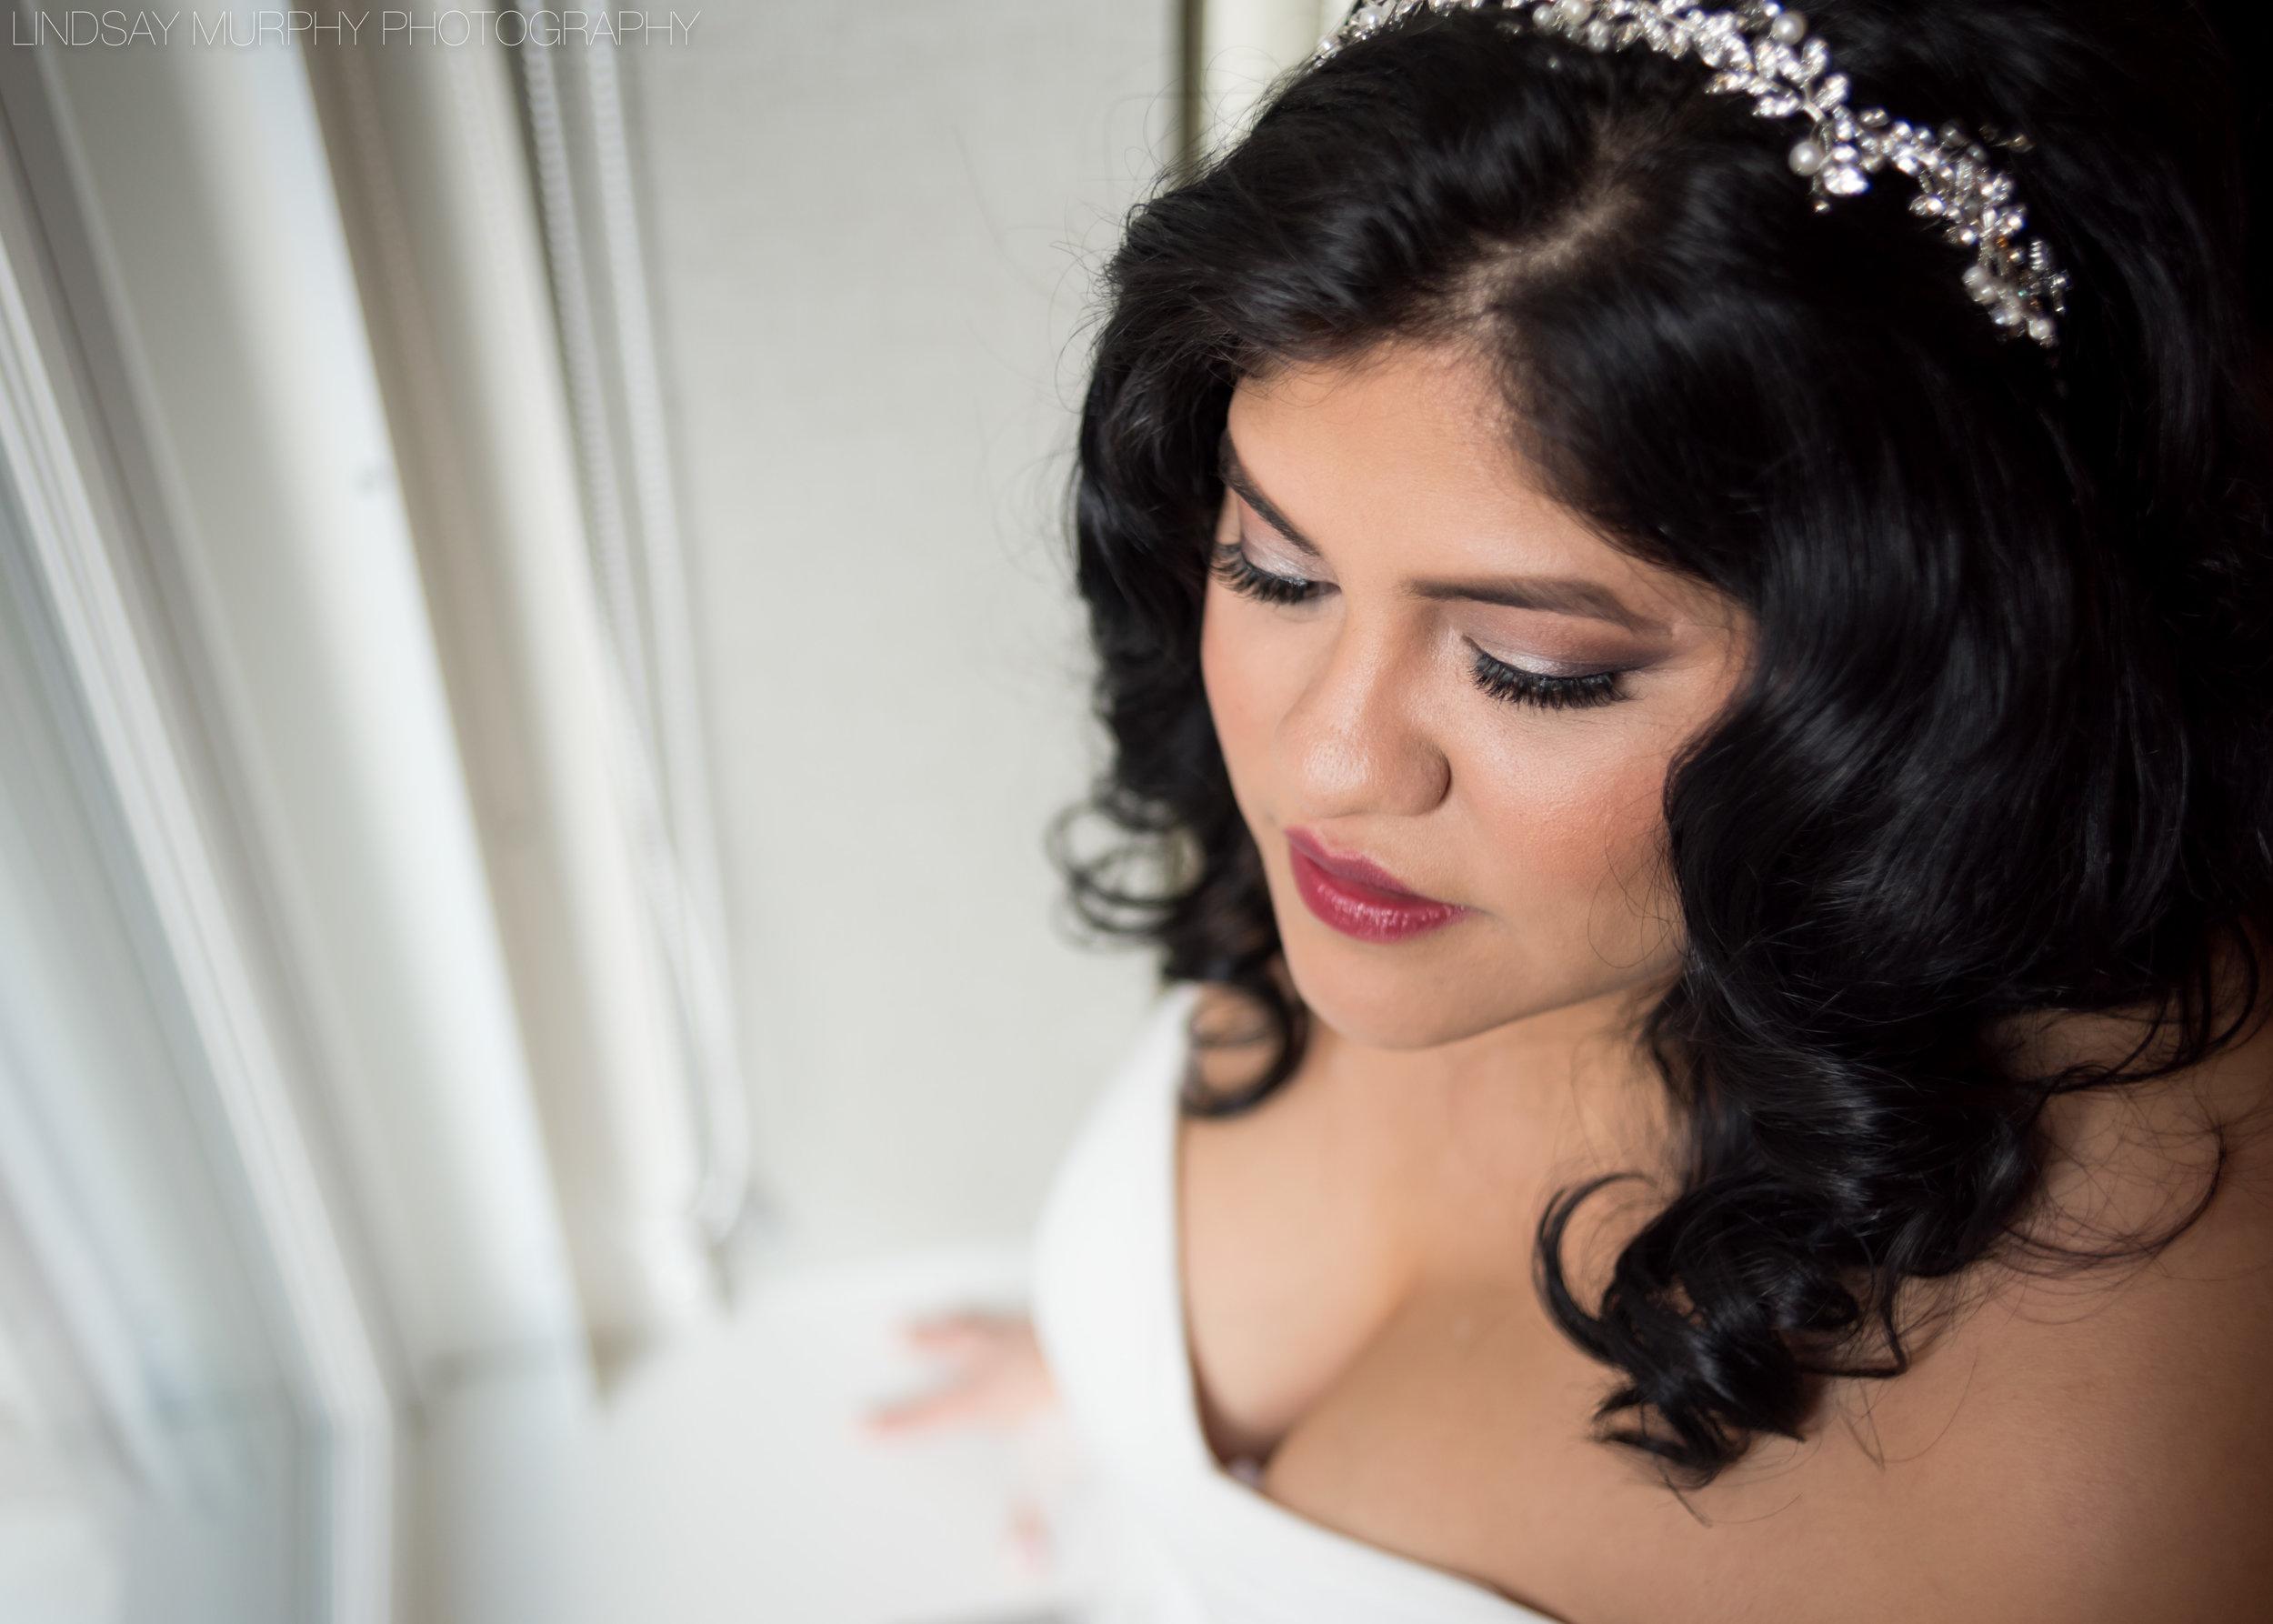 seattle_wedding_photography-25.jpg